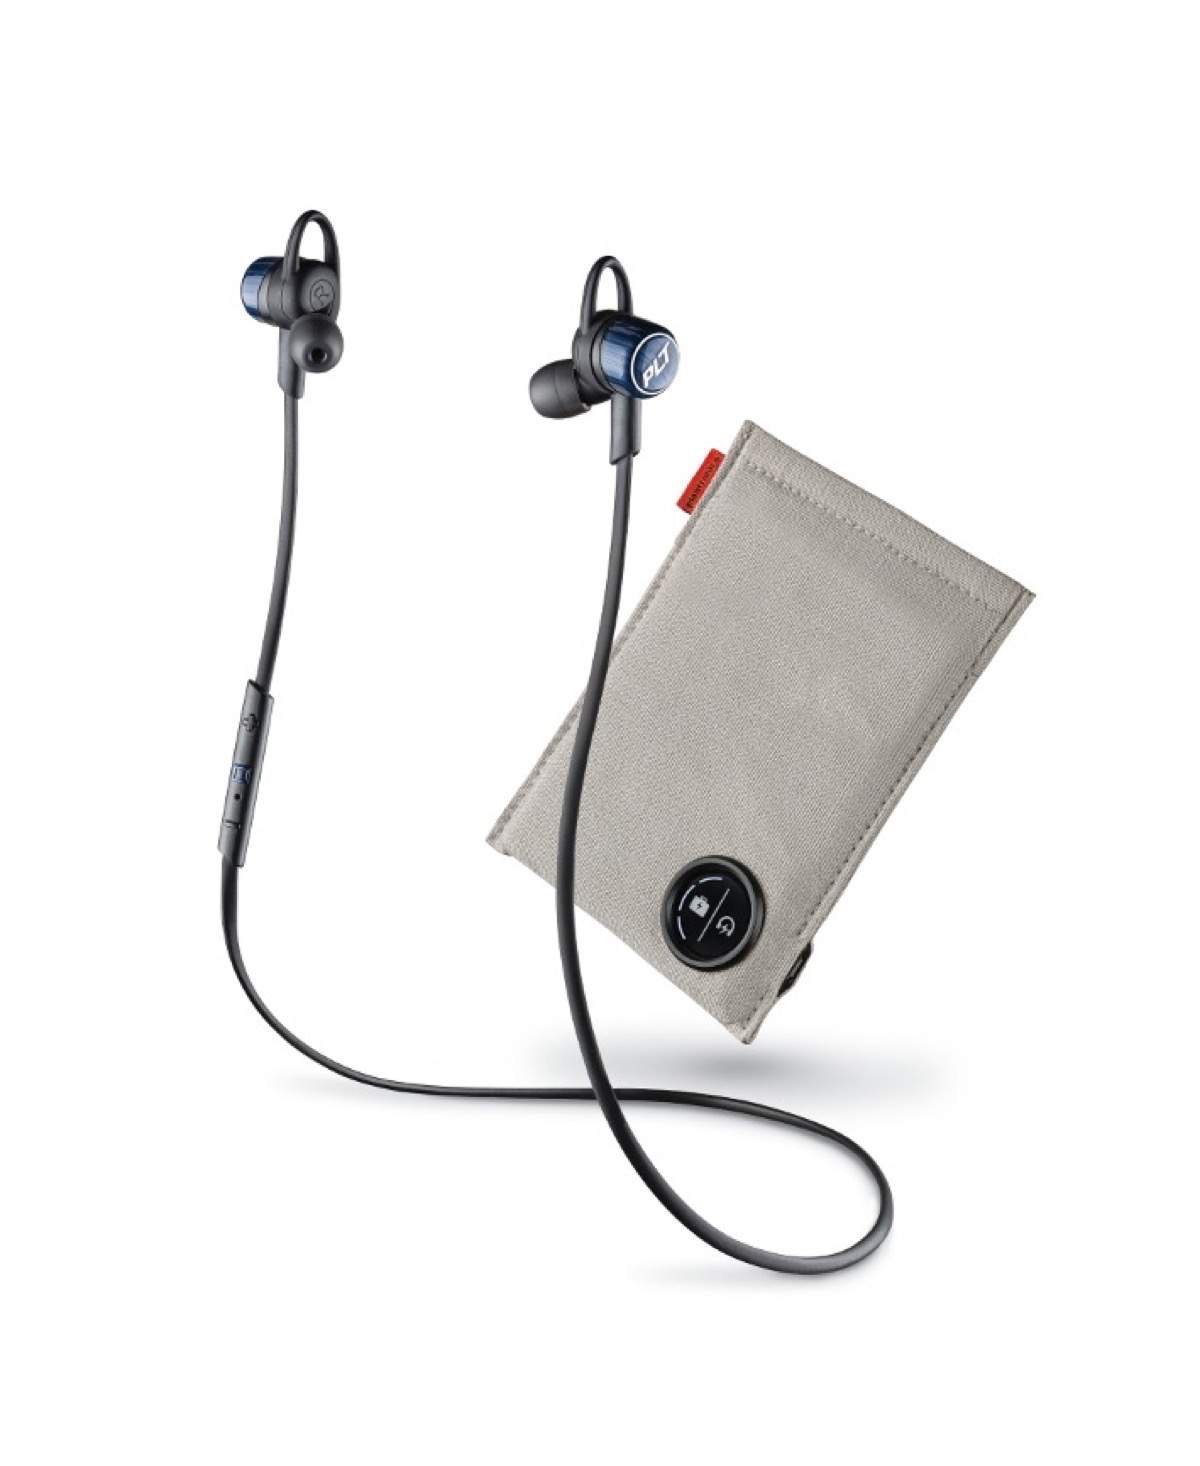 Plantronics BackBeat GO 3 – Schnurloses Stereoheadset für mobilen Musikgenuss